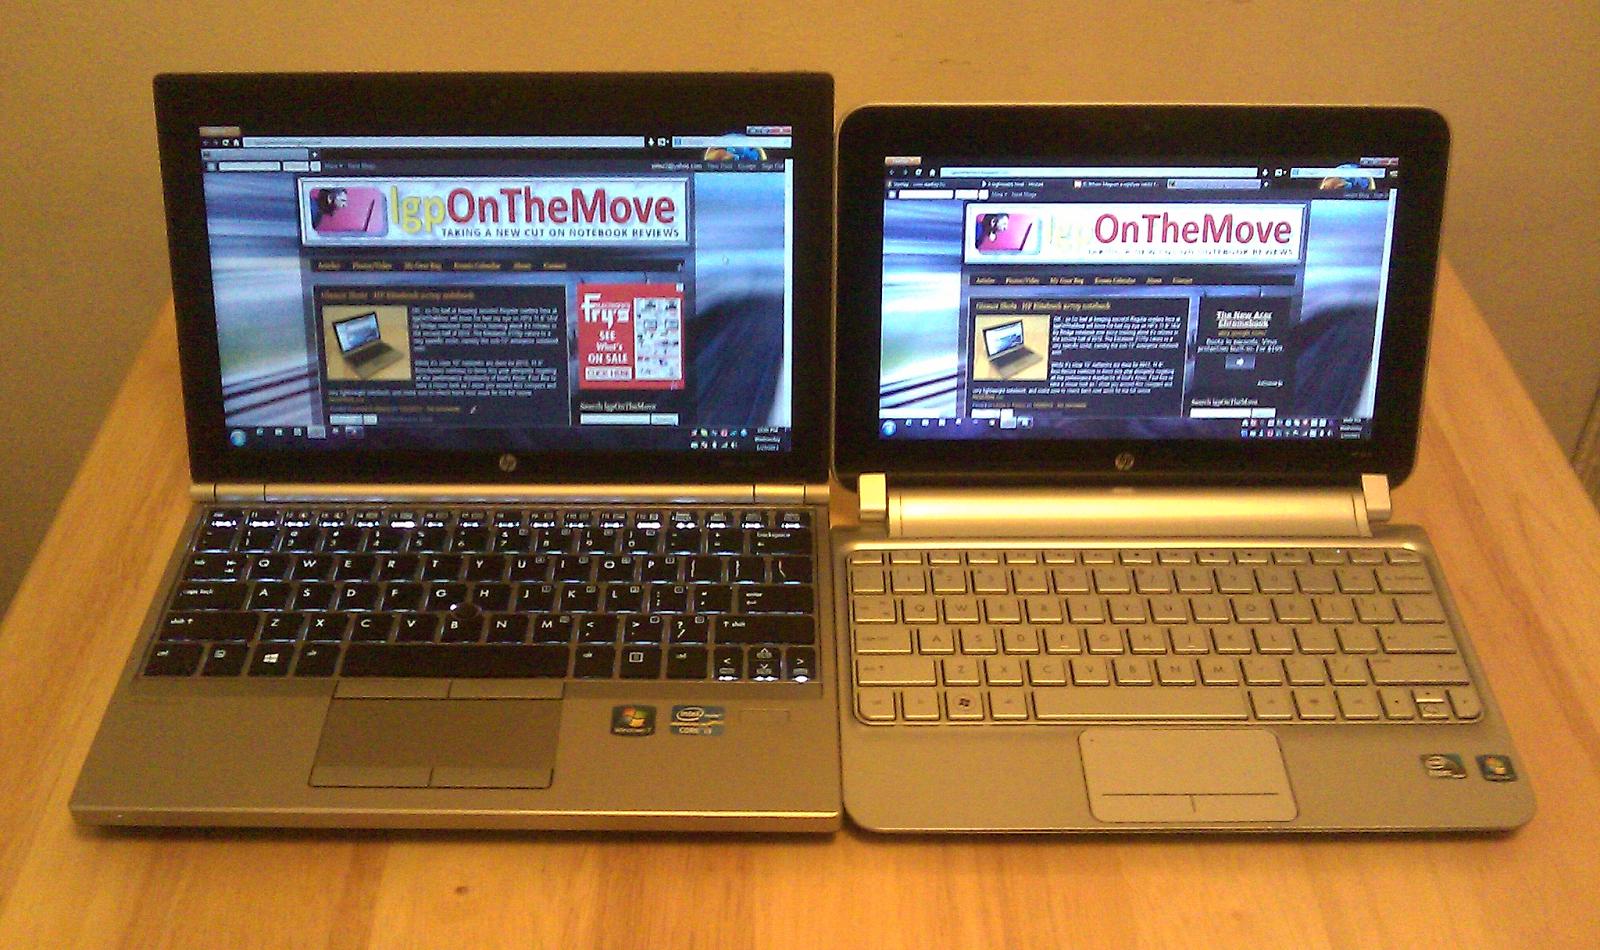 88c8ef4dd4d lgpOnTheMove: First Impressions - HP Elitebook 2170p notebook